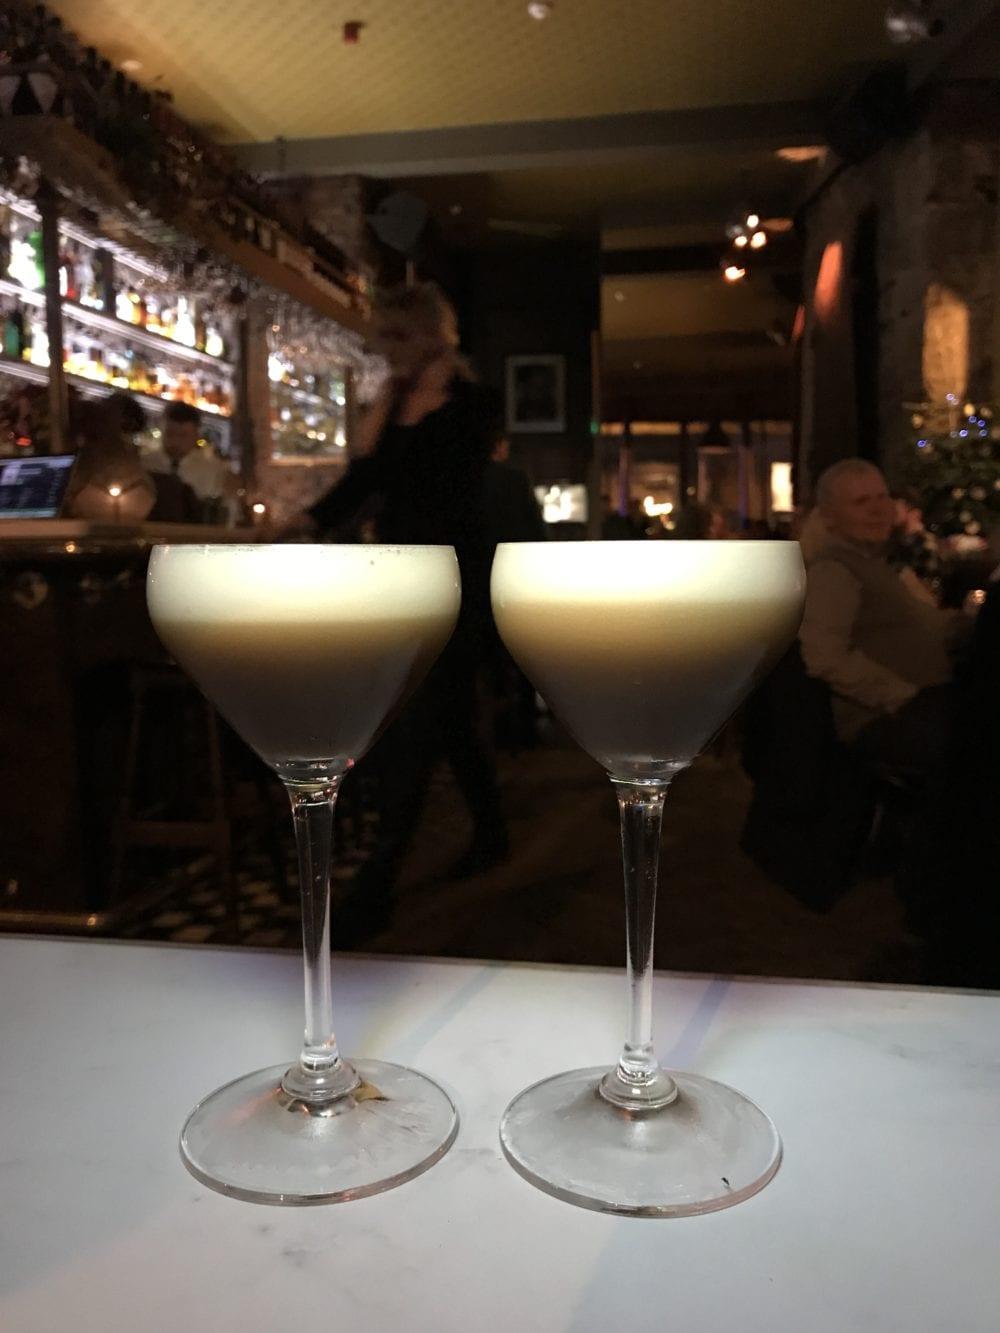 Espresso martini Kelvingrove cafe Veuve cliquot champagne grotto